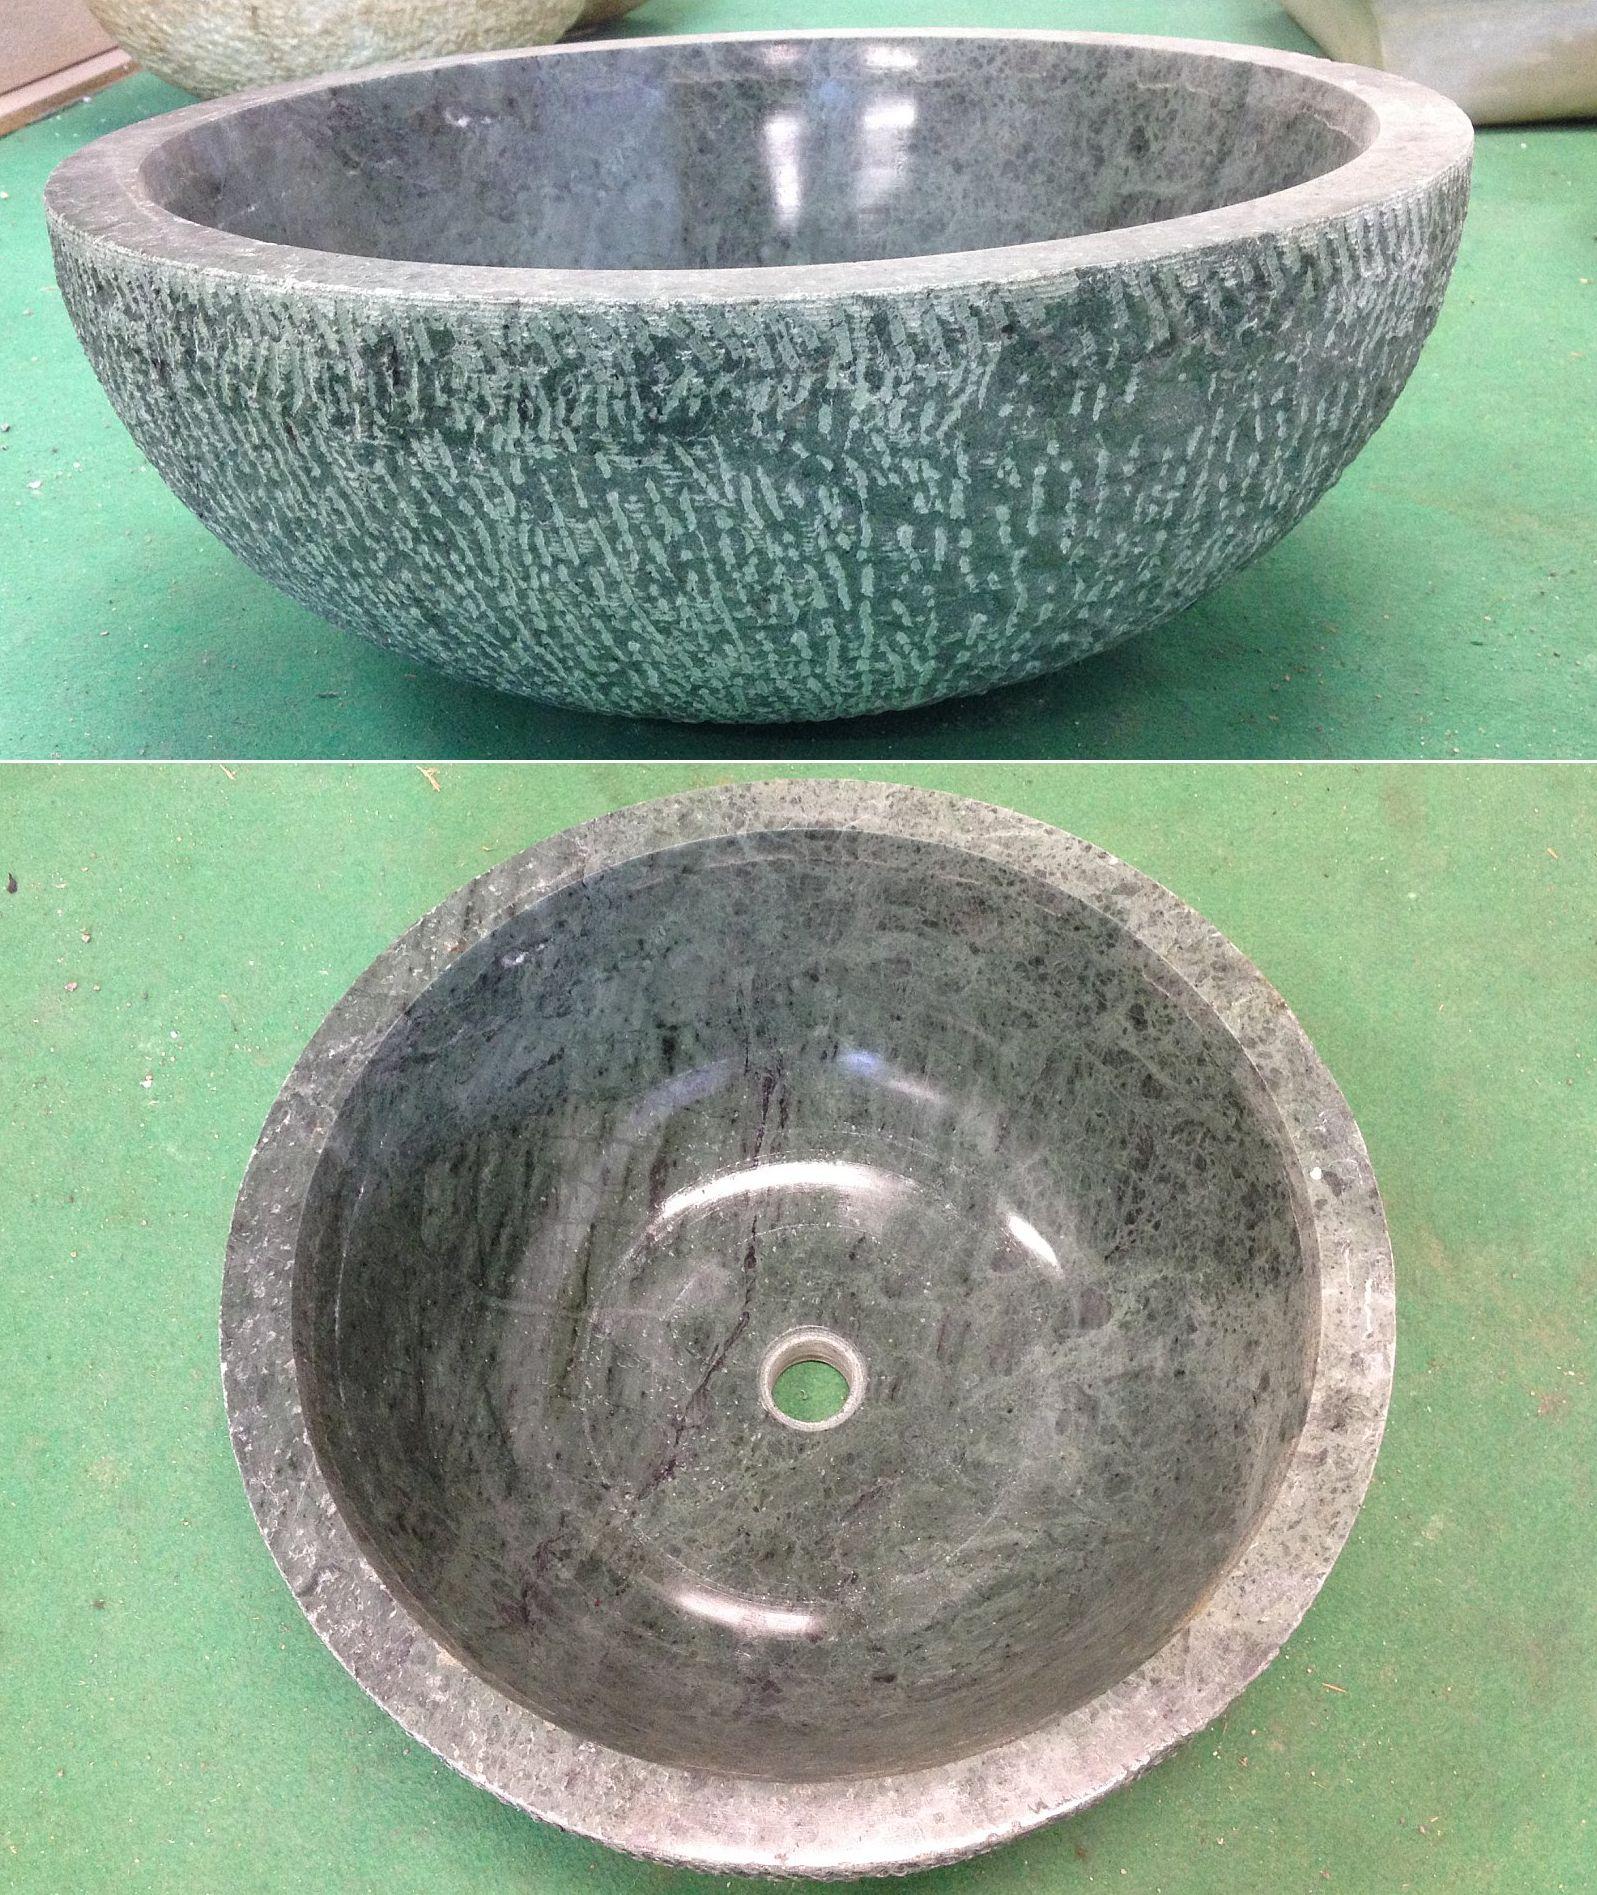 Lavandino in marmo verde cm 45x18 arredo bagno laverde45 - Arredo bagno verde ...